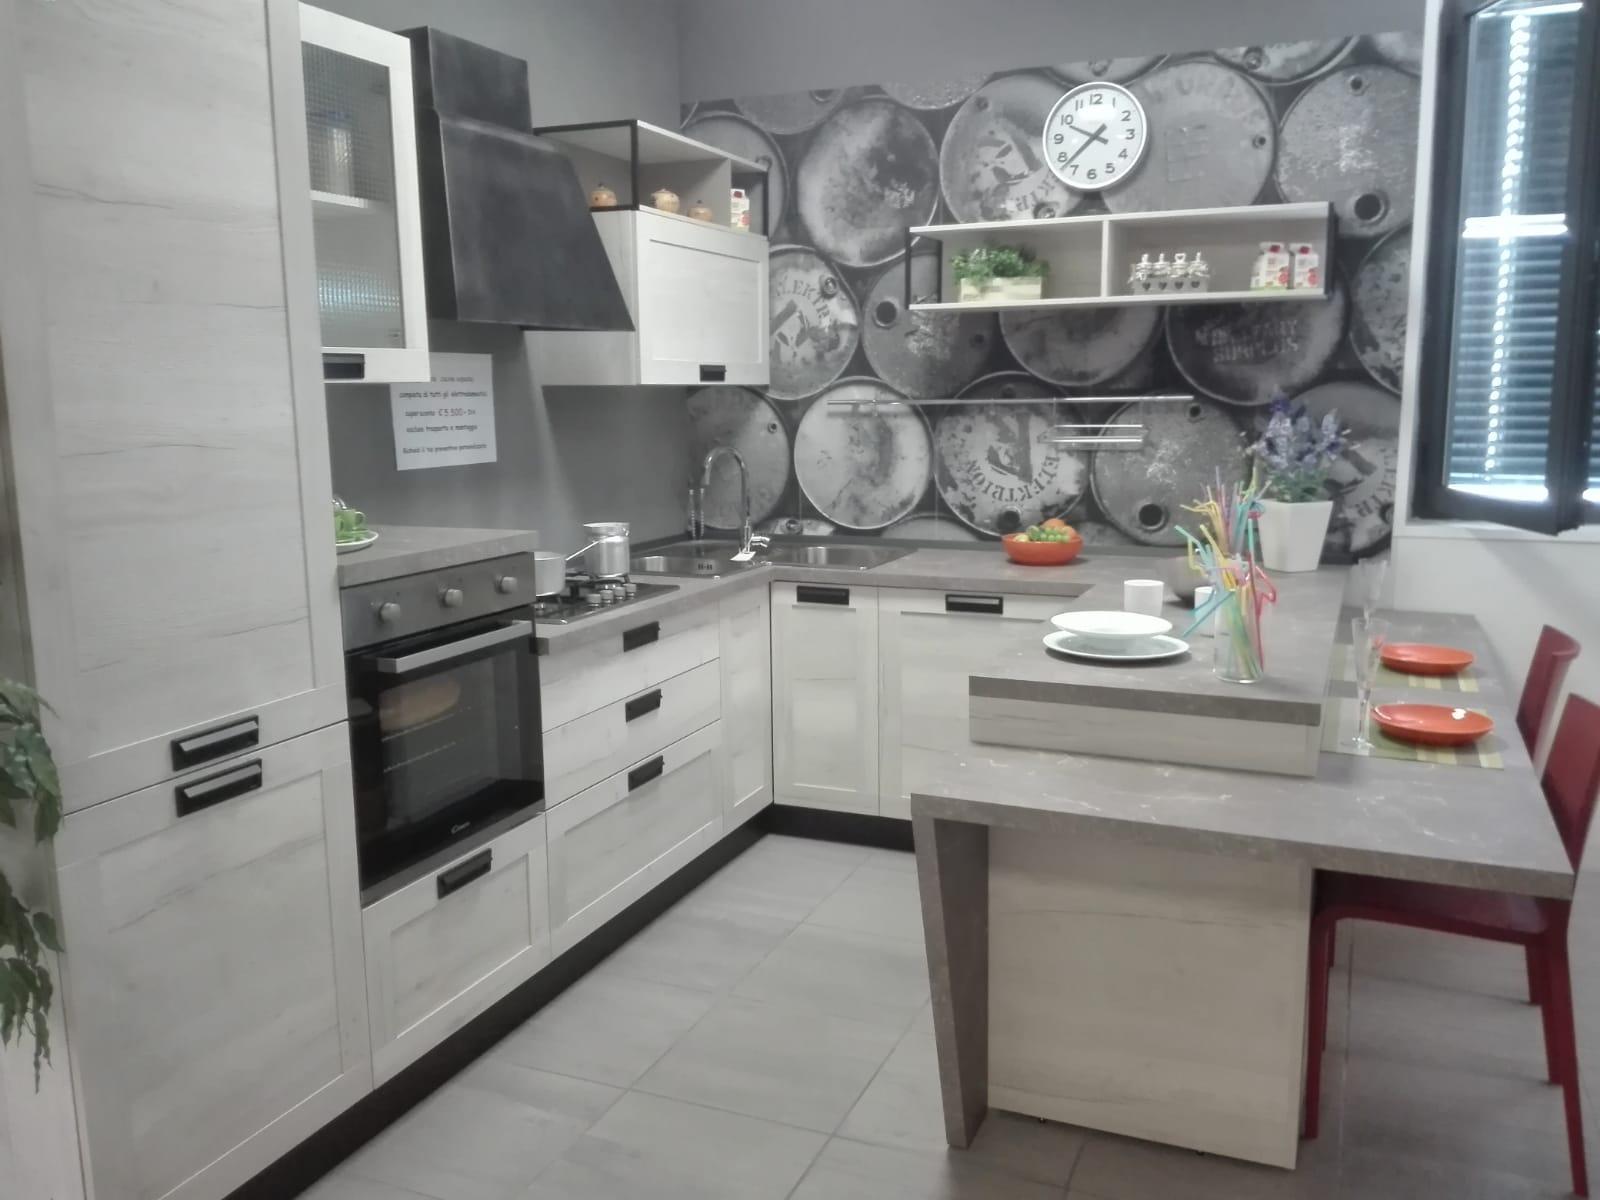 Offerta Cucina € 5.500 + IVA  modello LIPARI